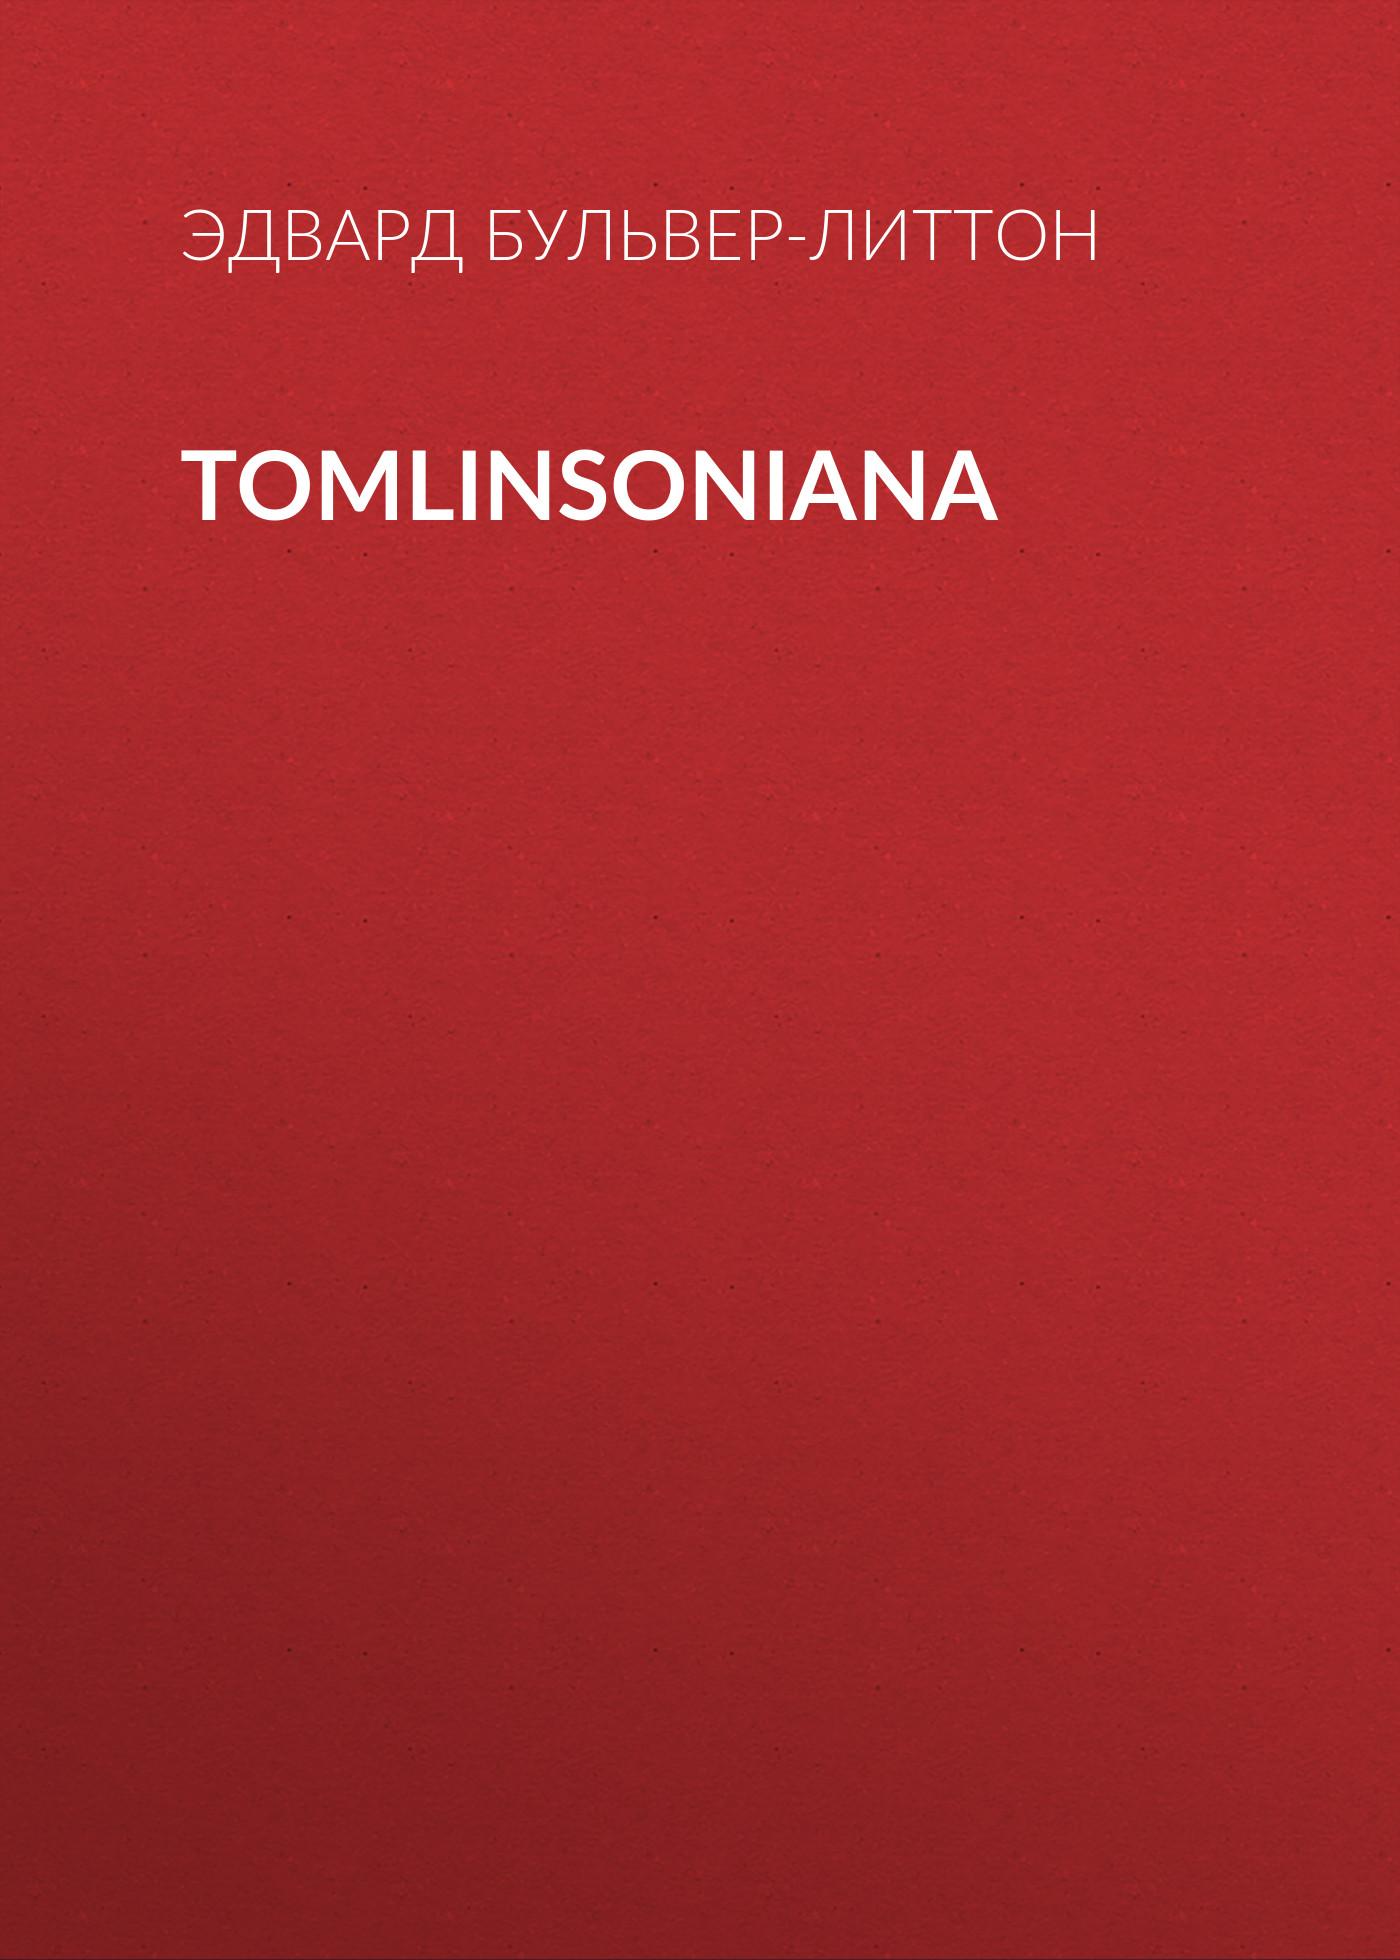 Tomlinsoniana